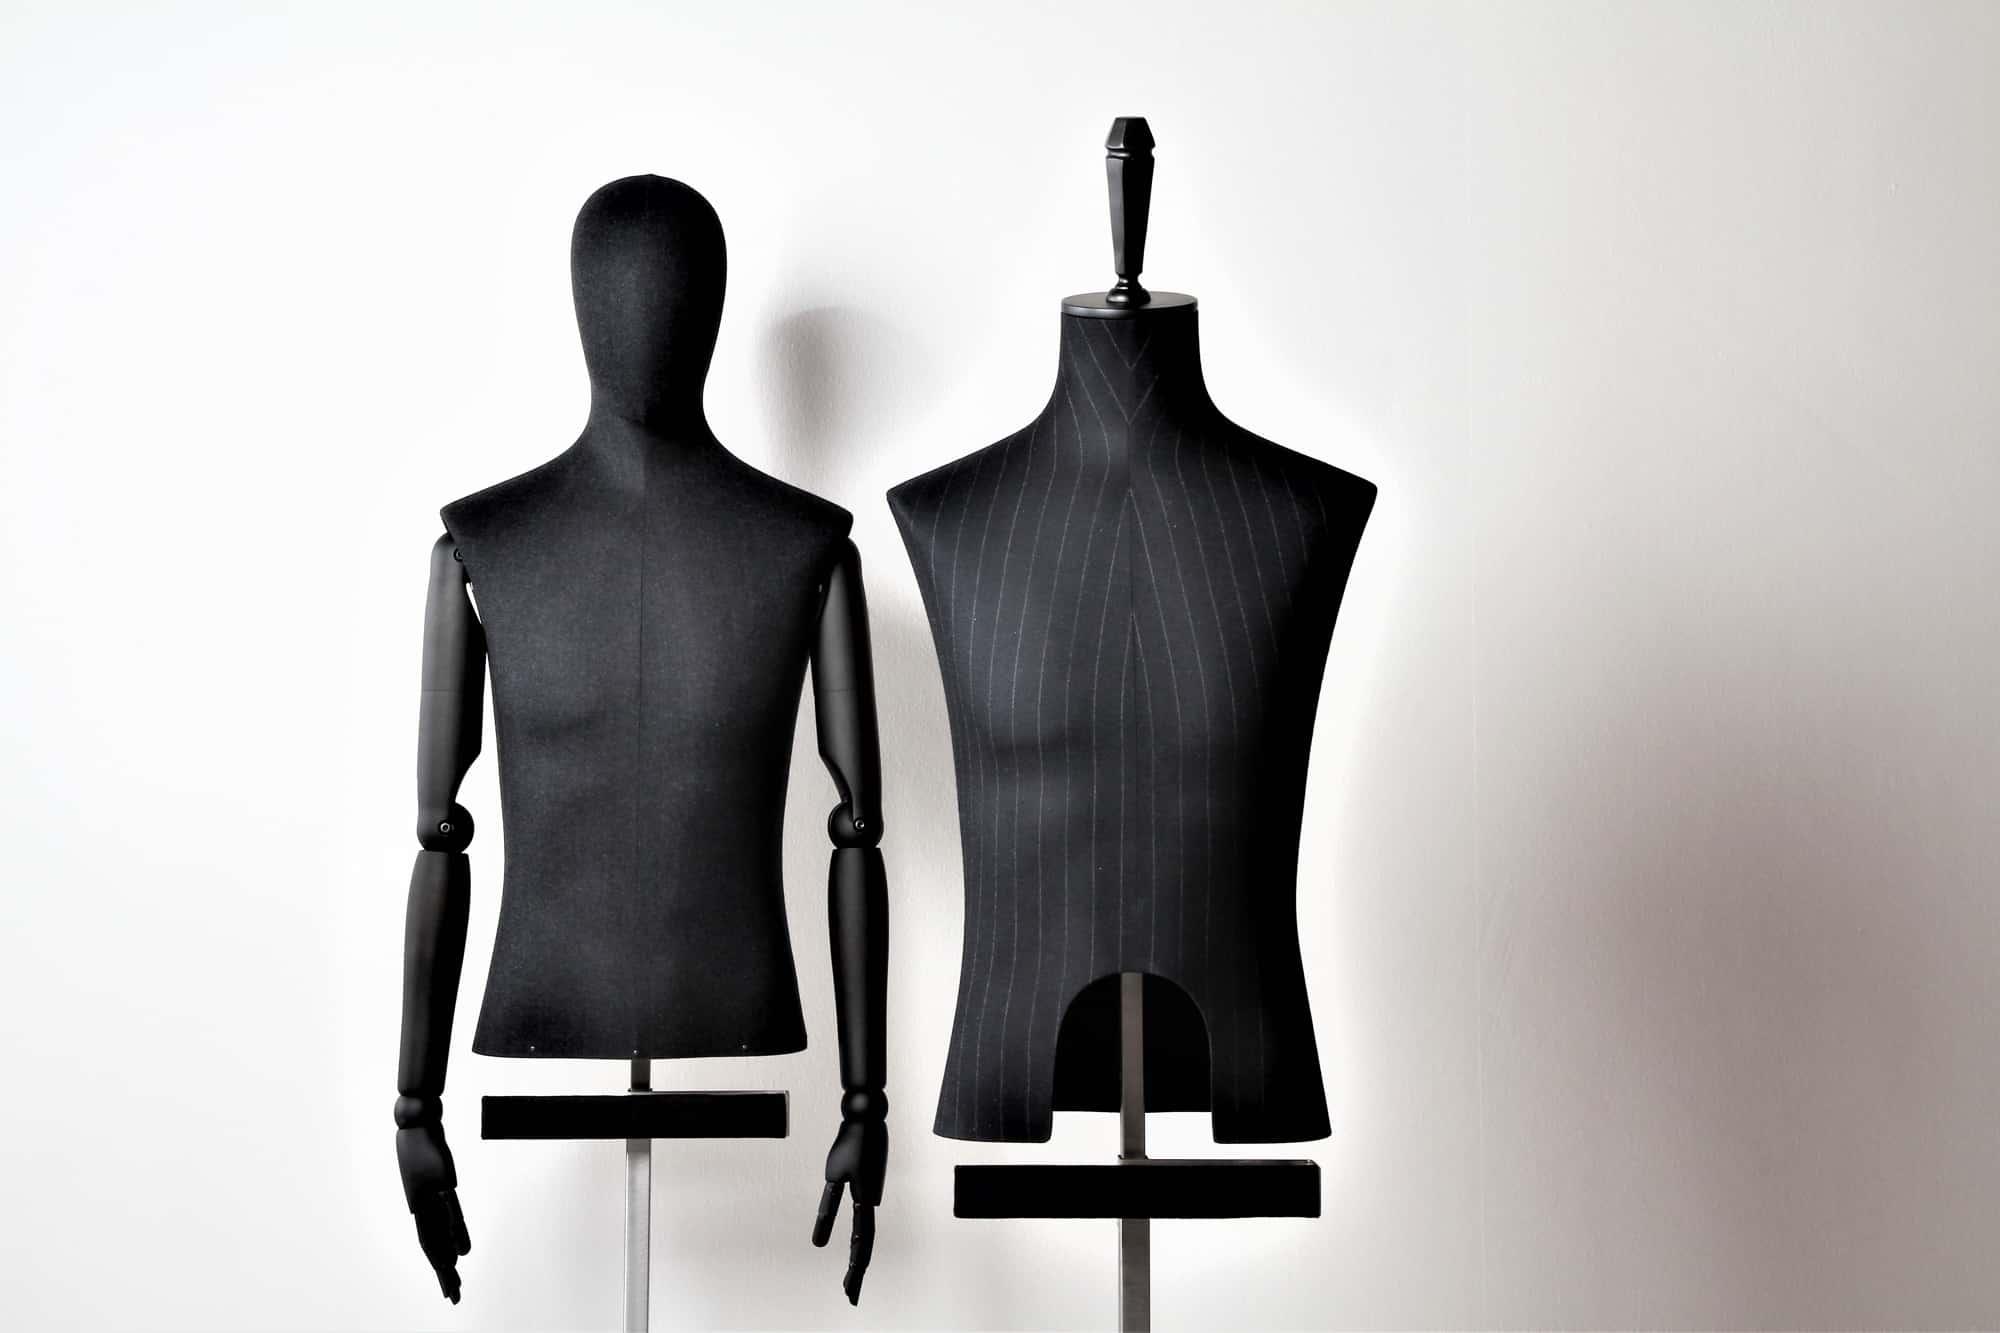 bonaveri bust forms mannequins sartorial 01